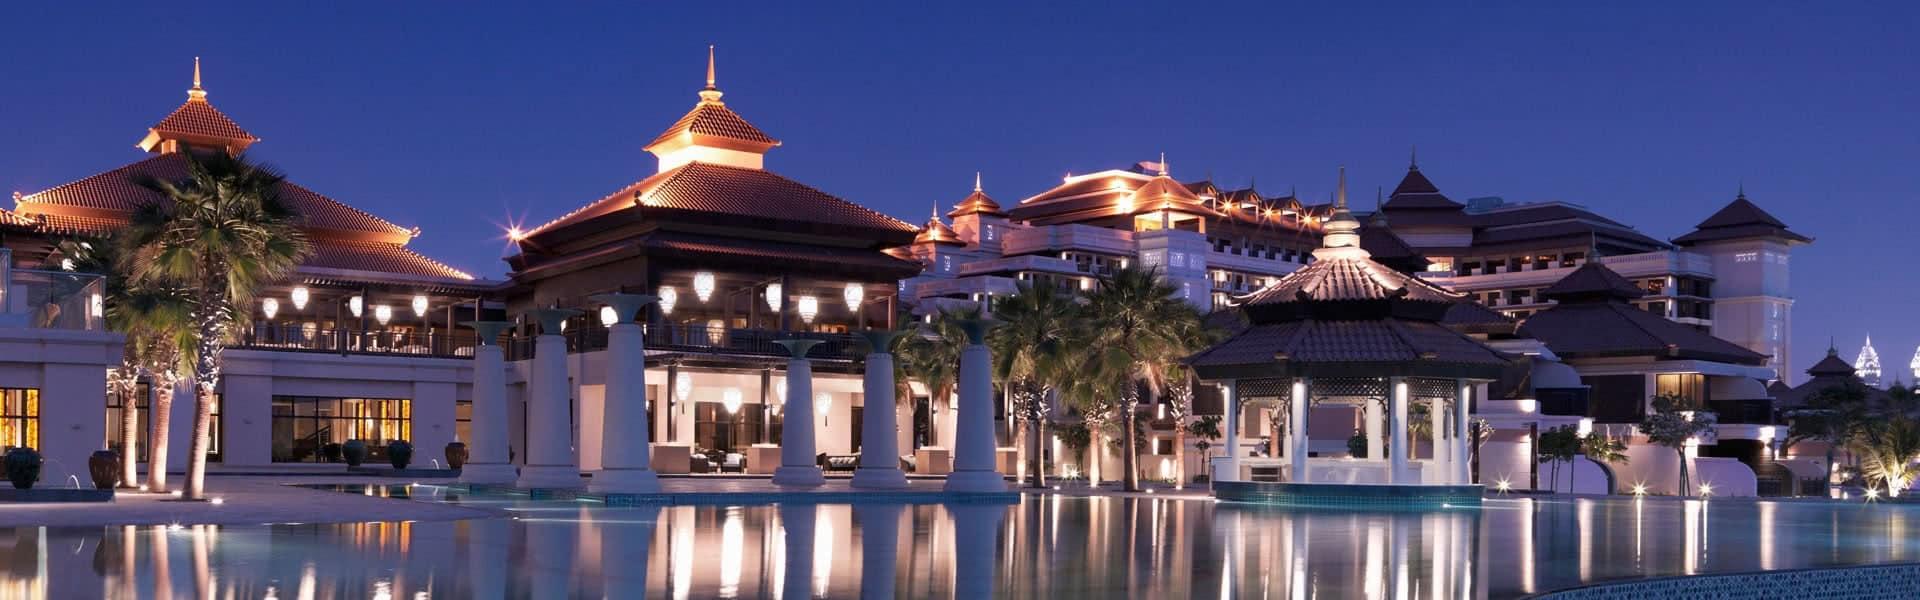 Anantara logo clipart vector stock The Palm Jumeirah Hotels   Offers at Anantara Dubai The Palm vector stock